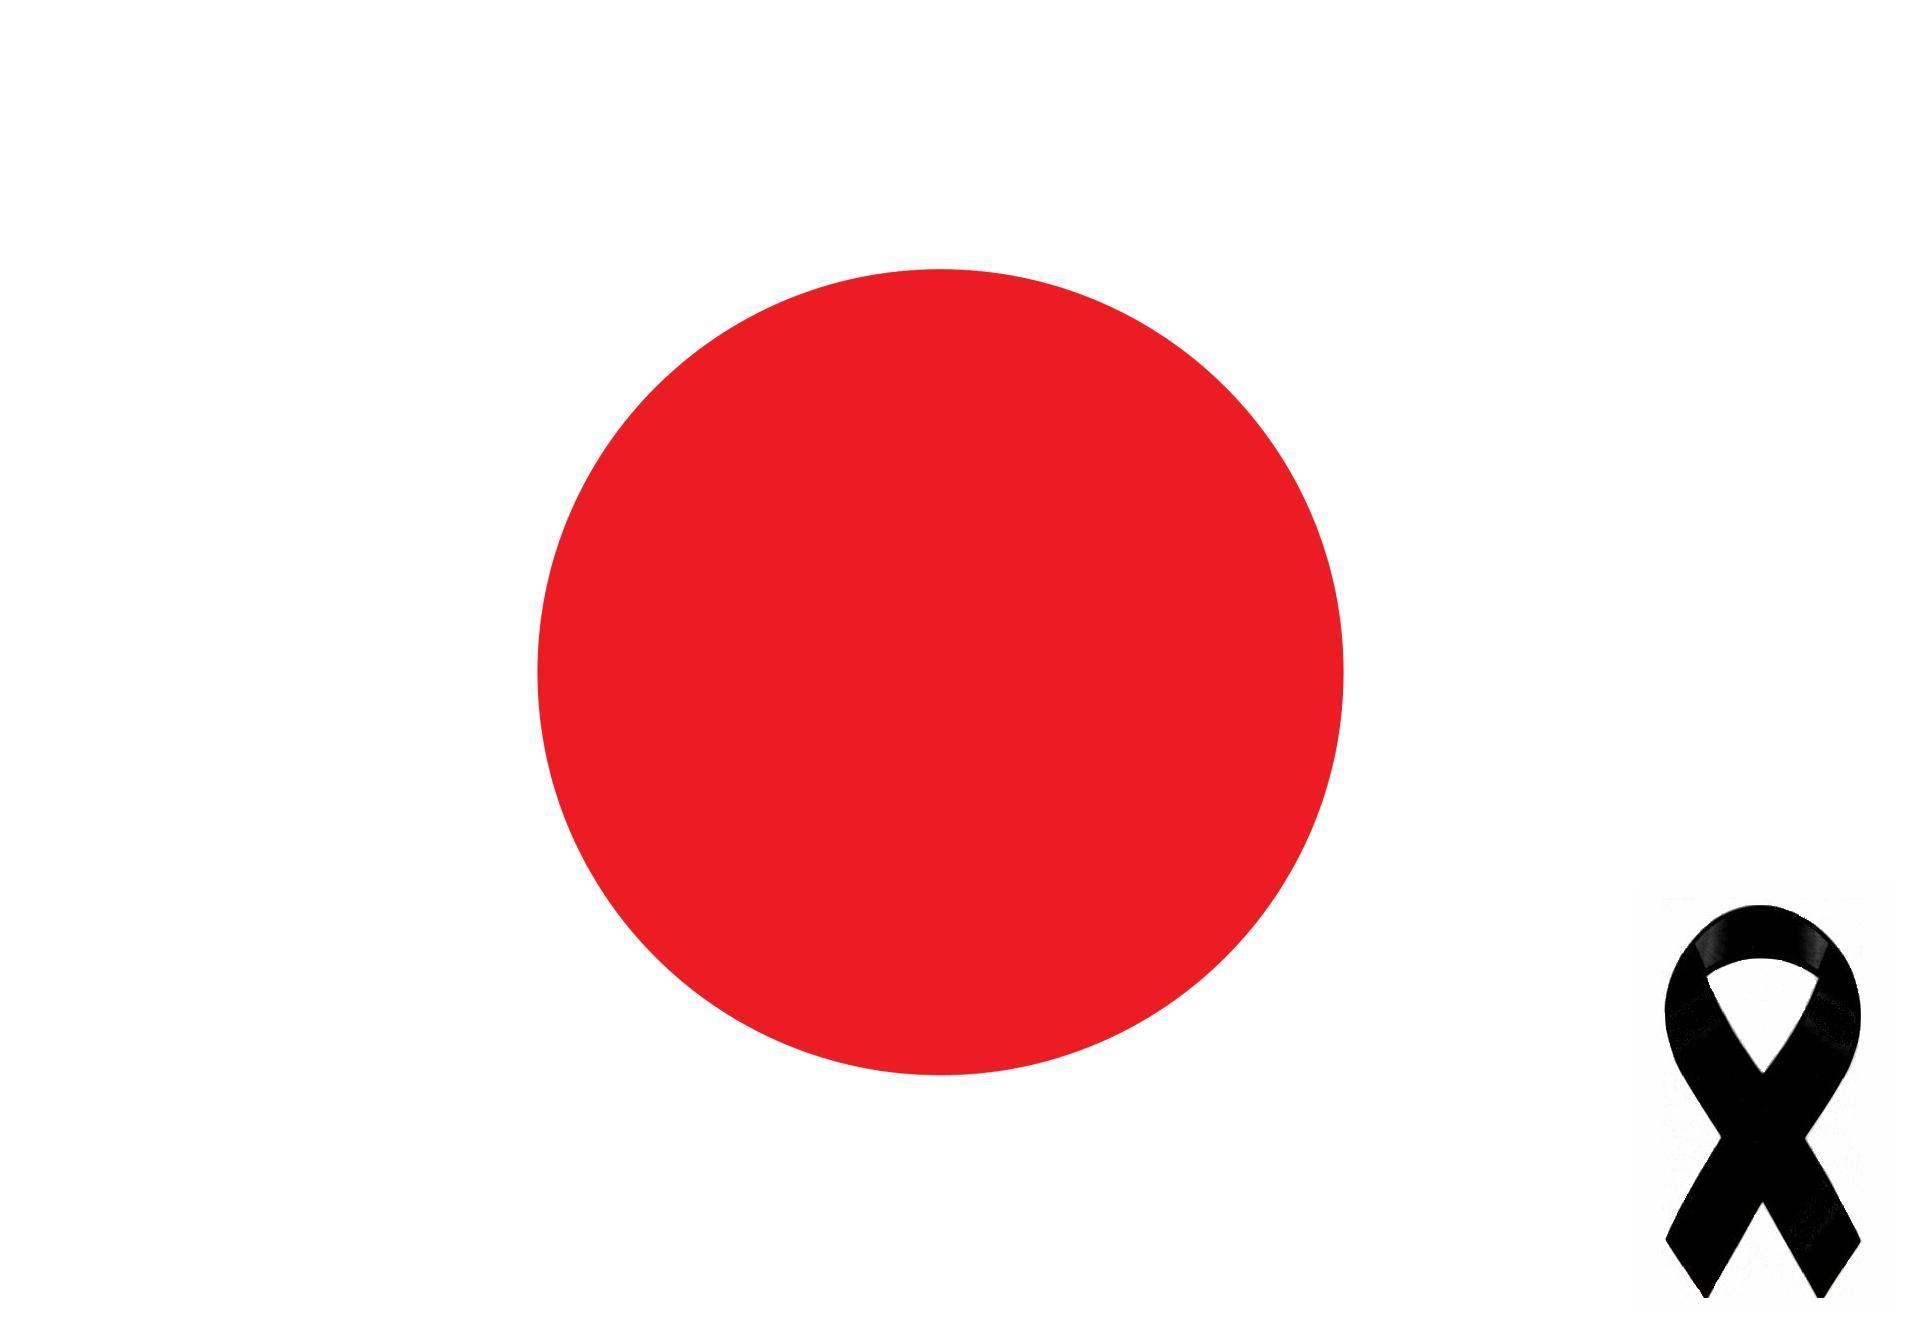 A black ribbon for Japan